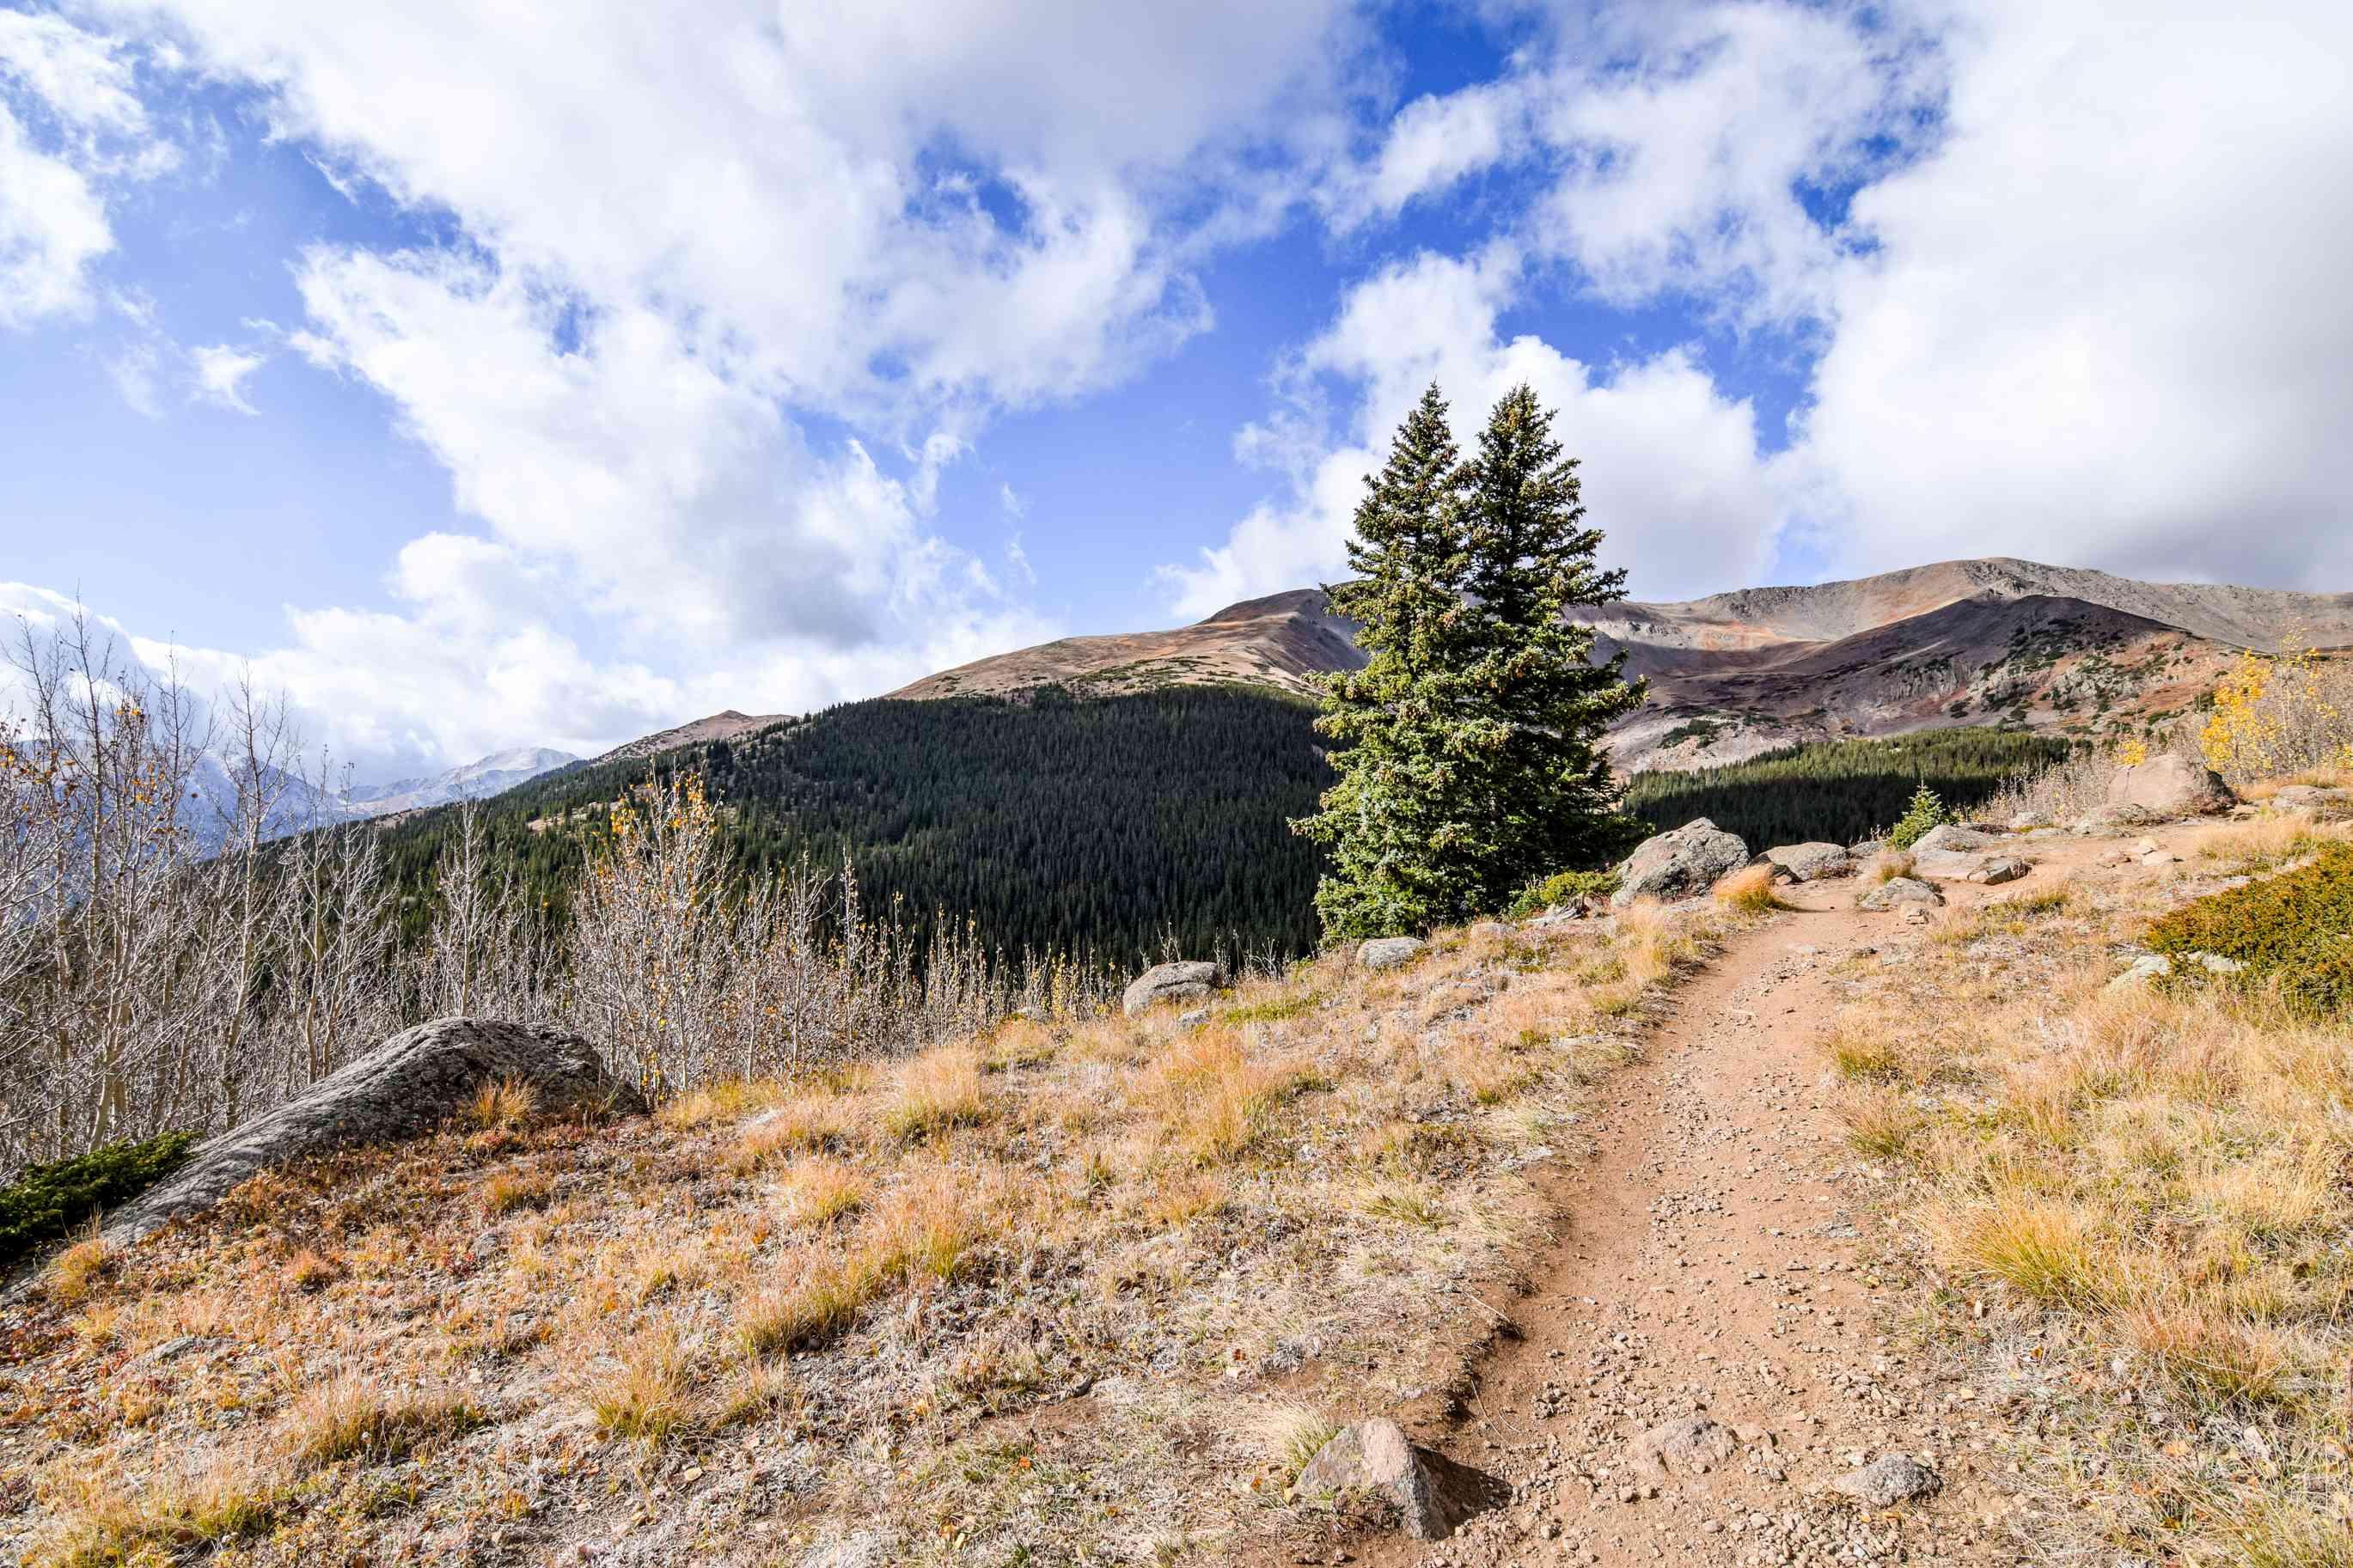 Climbing Mount Elbert